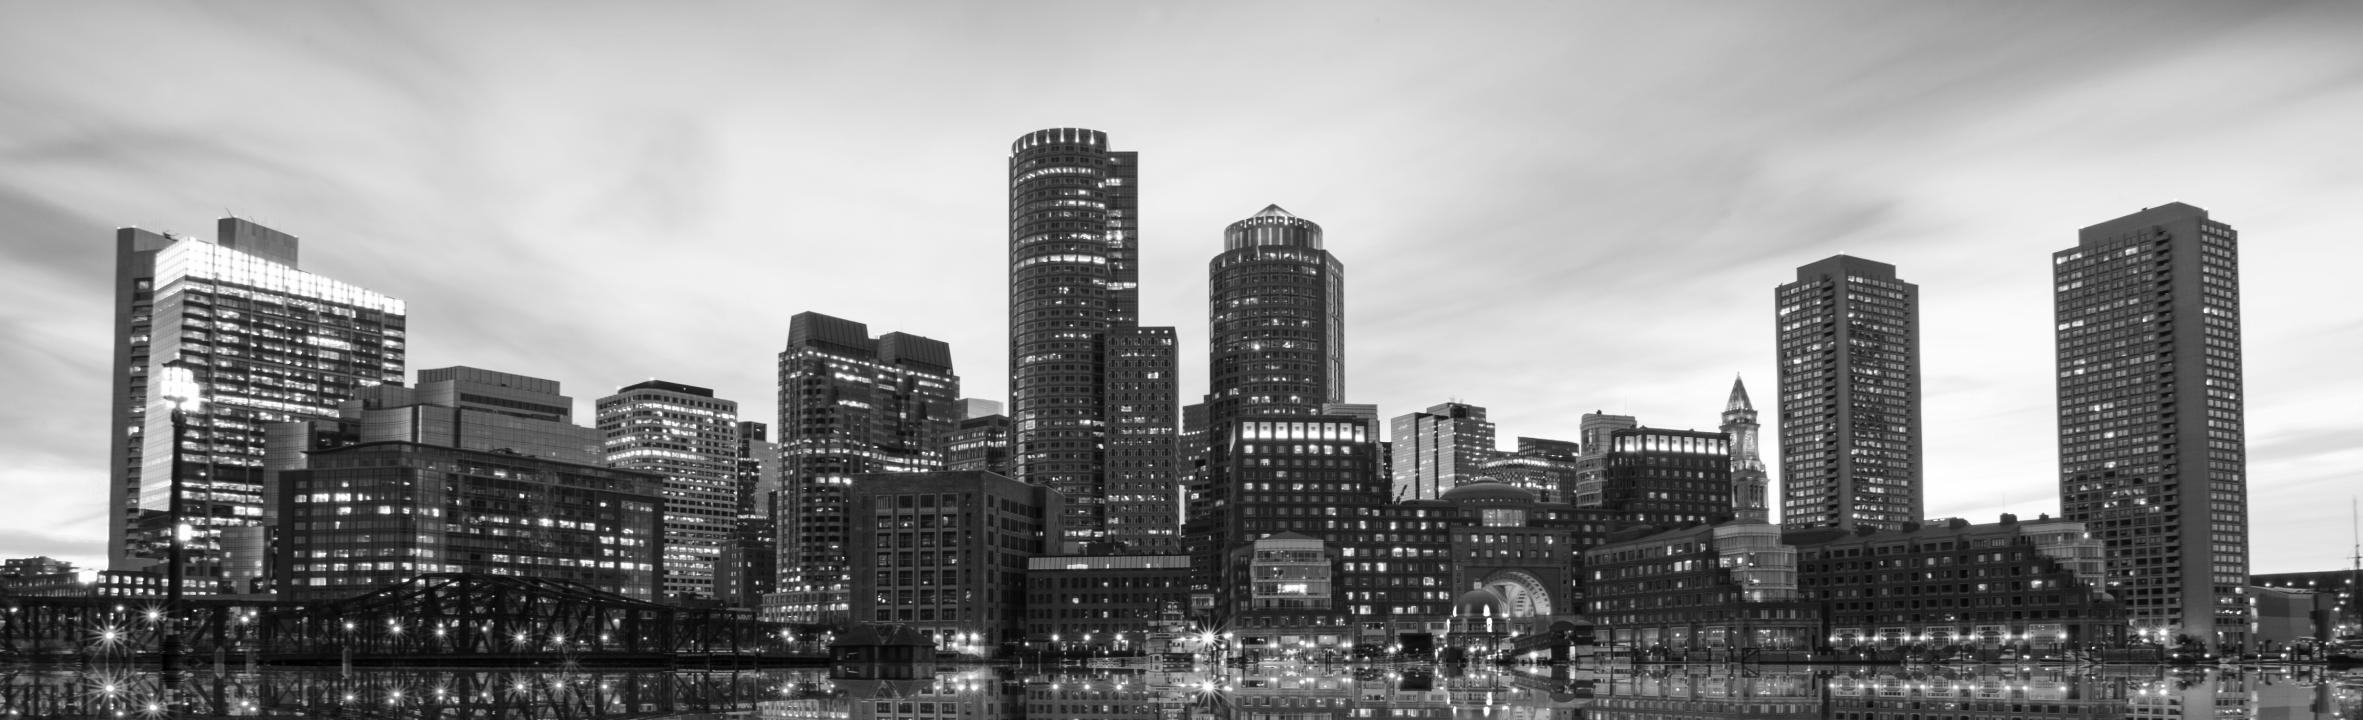 boston-cityscape-black-and-white